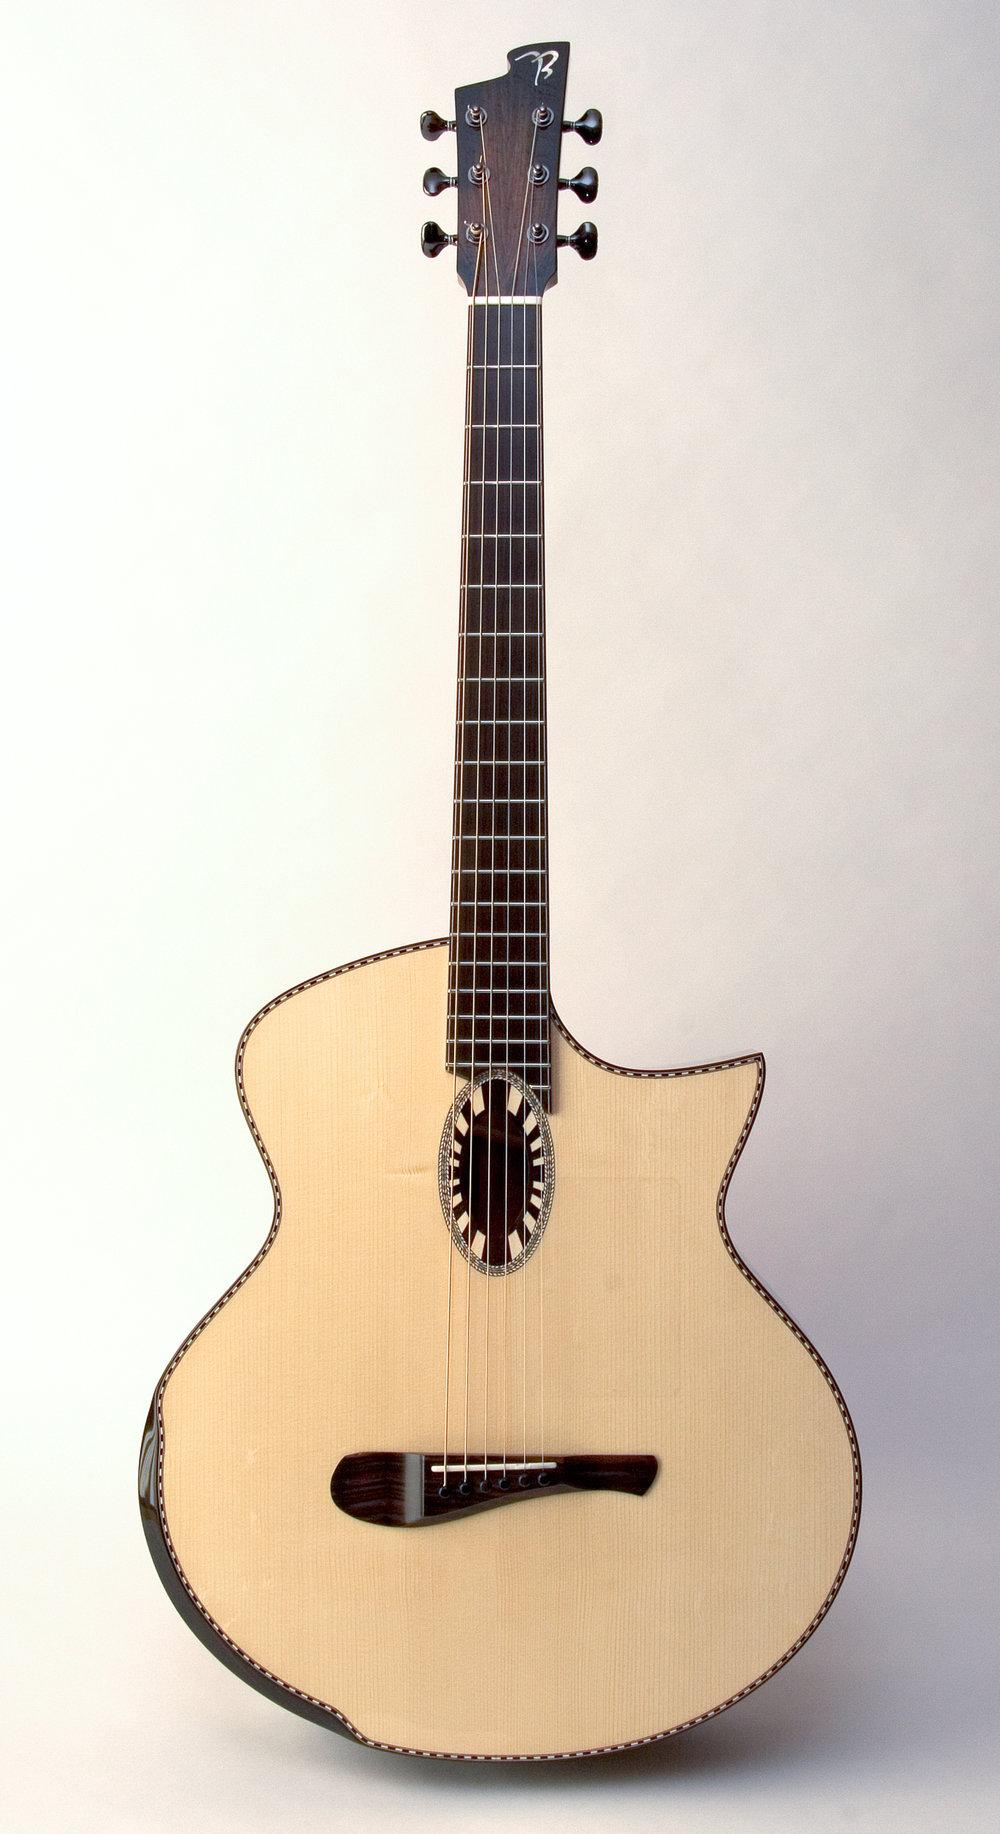 Model 4 - 16.75